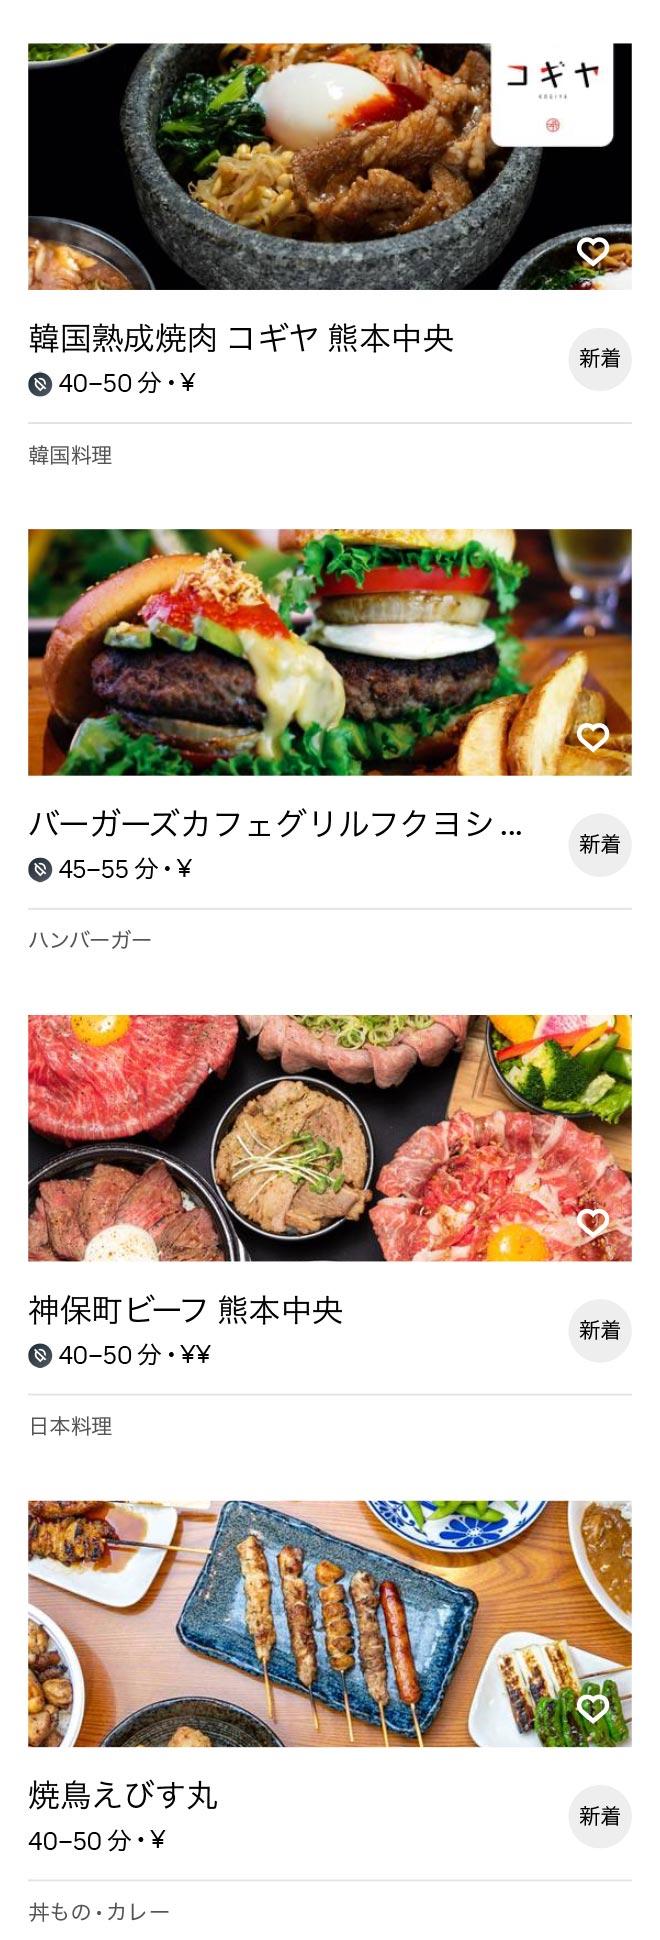 Kumamoto menu 2008 04